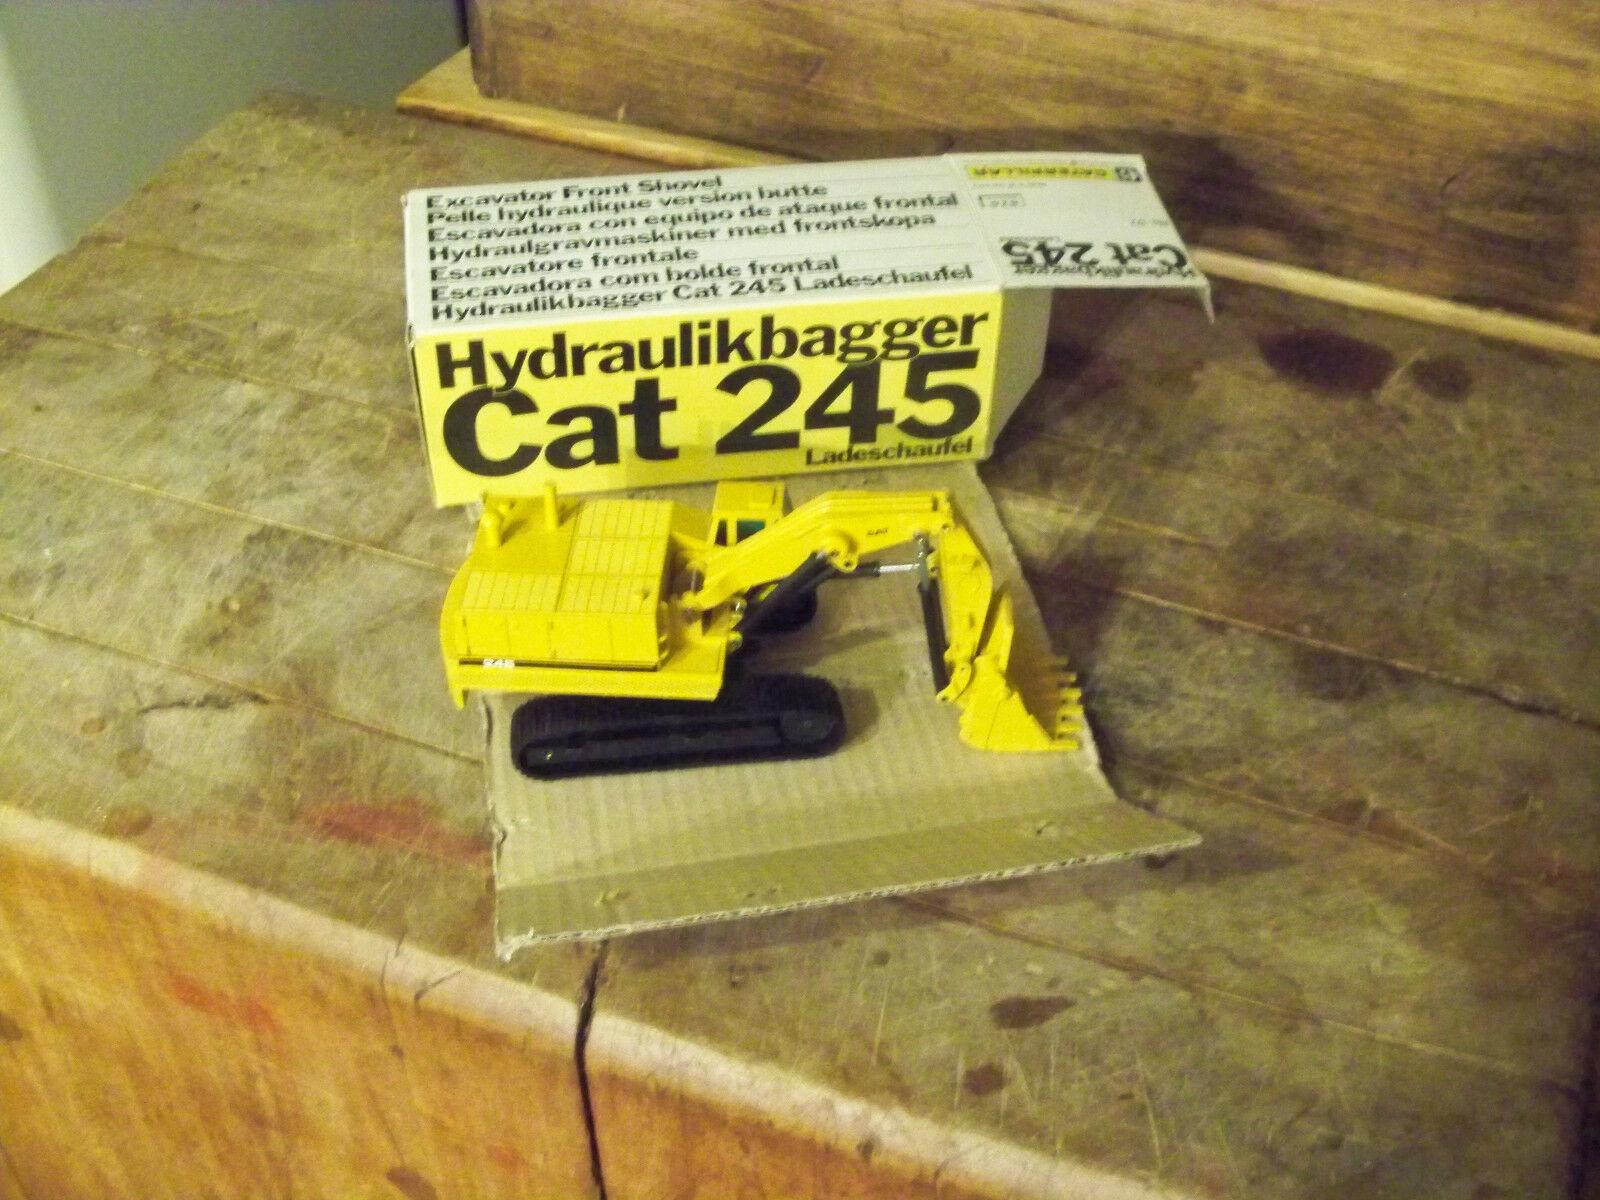 NZG No 177 Cat Cat Cat 245 (Caterpillar) Toy and Box are Mint German 0fb776